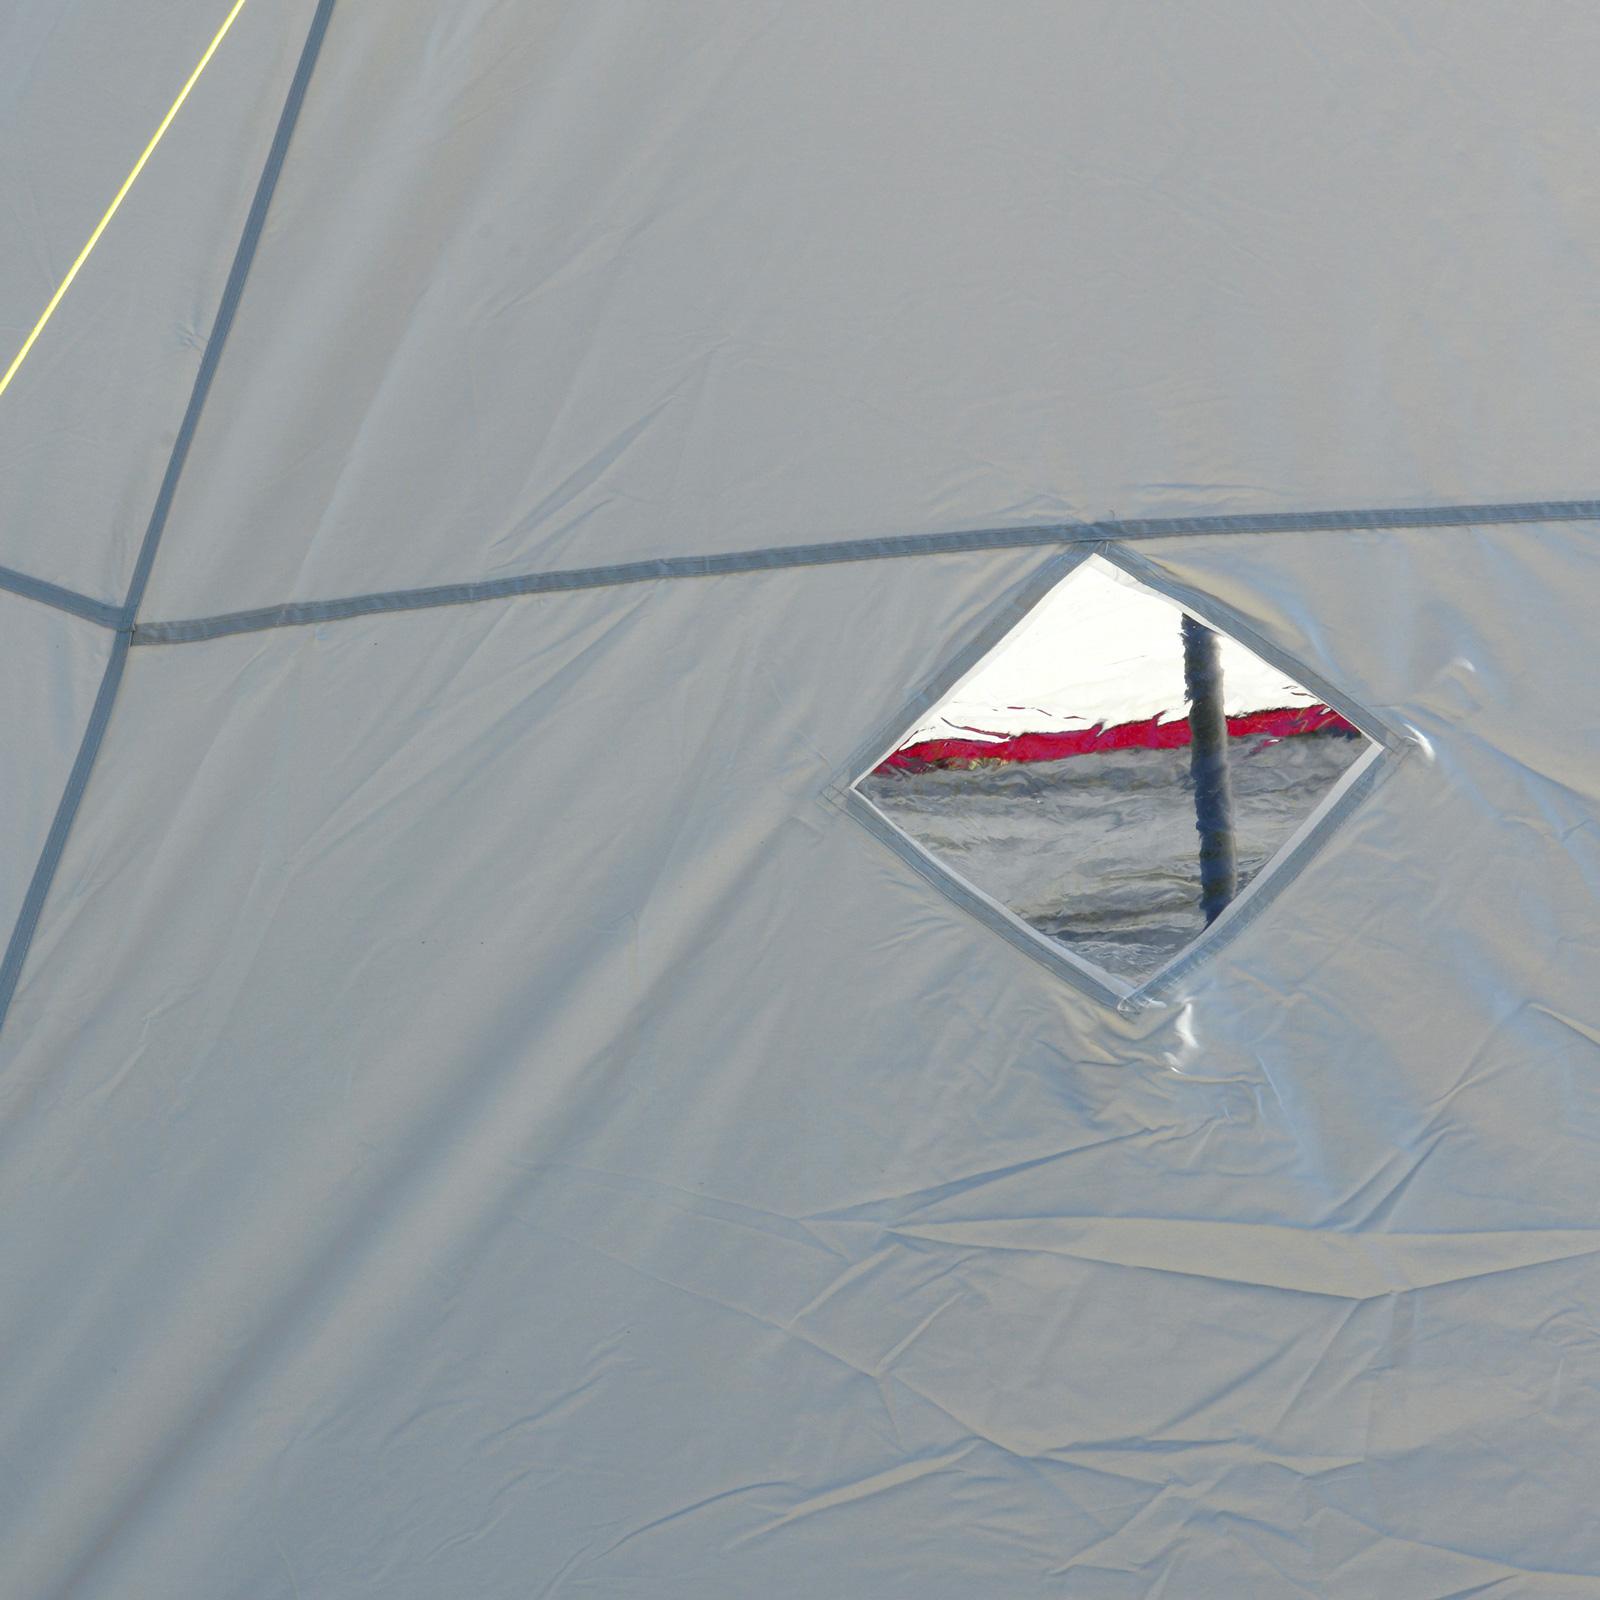 skandika-Teepee-250-Camping-Party-Festival-Tent-2-5-M-Height-3000mm-Column-New thumbnail 8